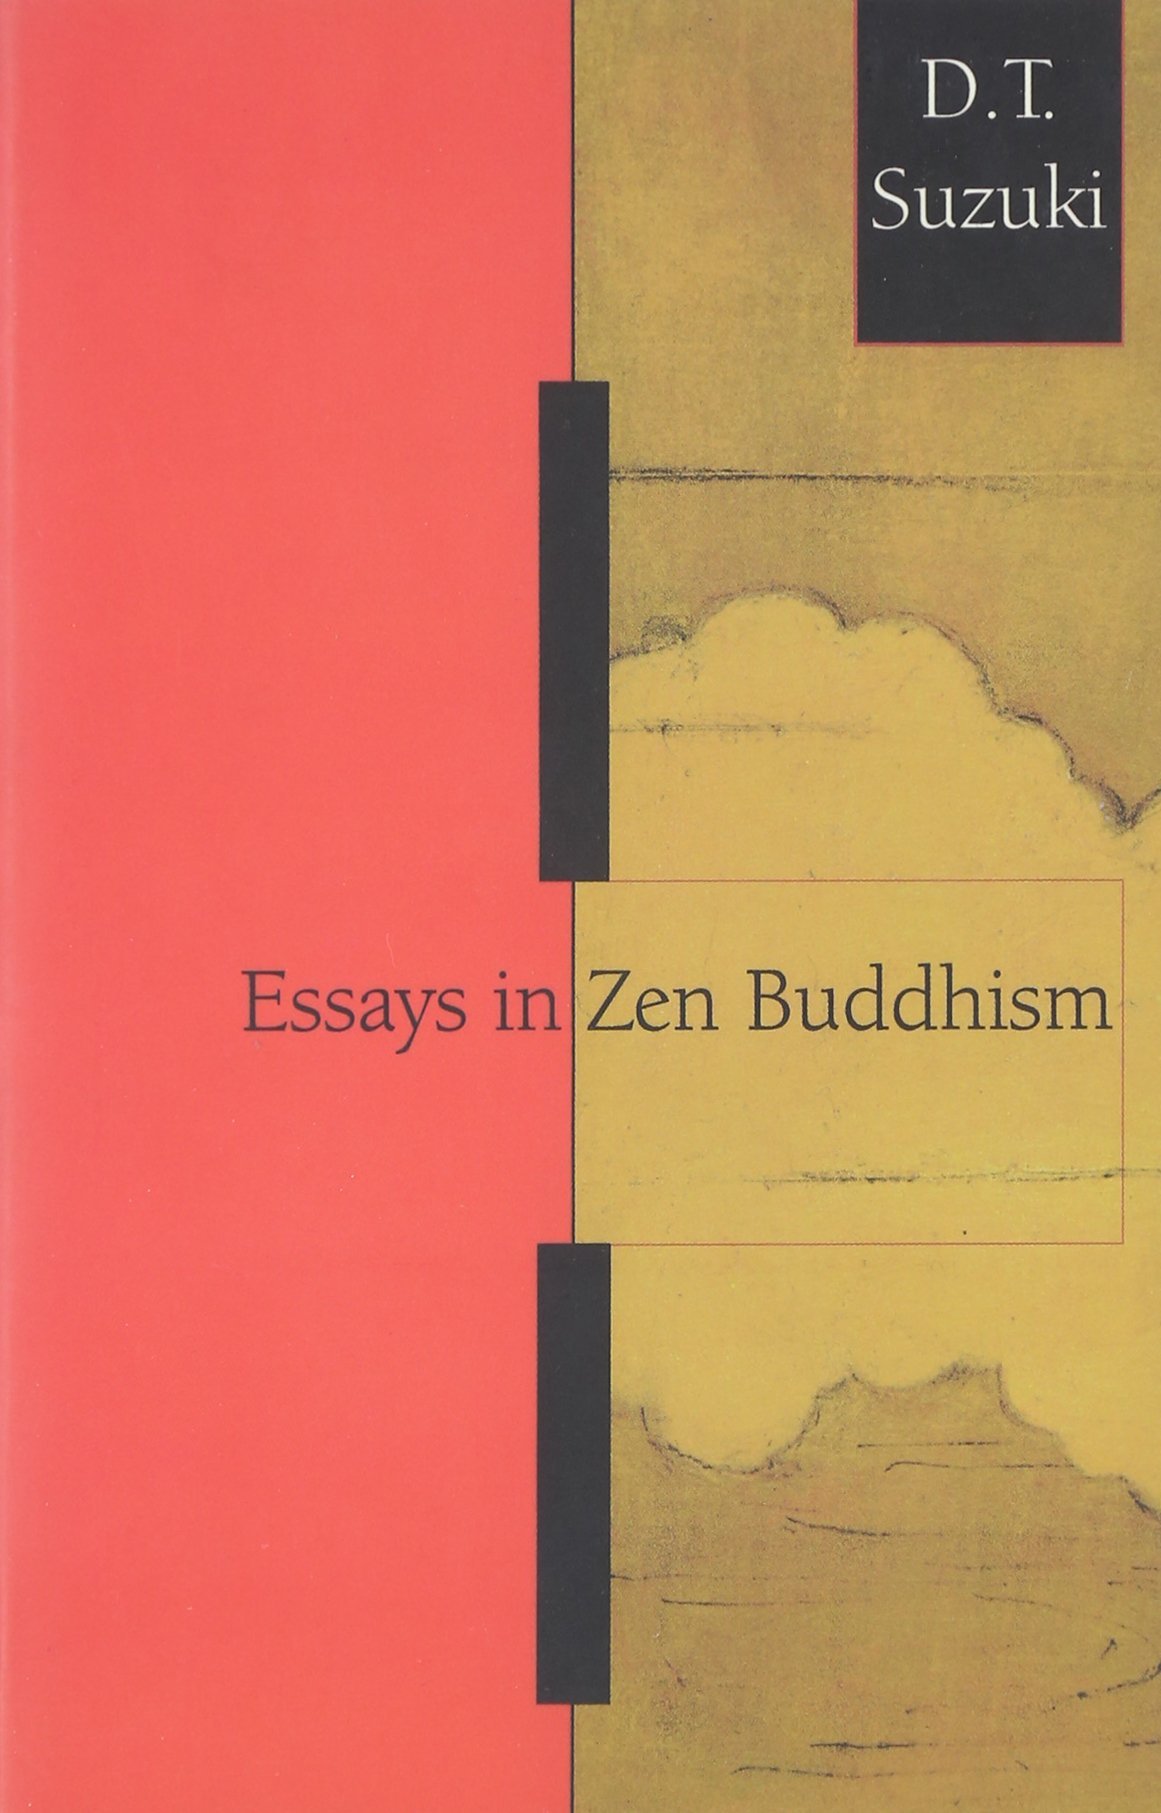 003 71cccelhvrl Essay Example Essays First Stunning Series Emerson Pdf Shelburne Publisher Full